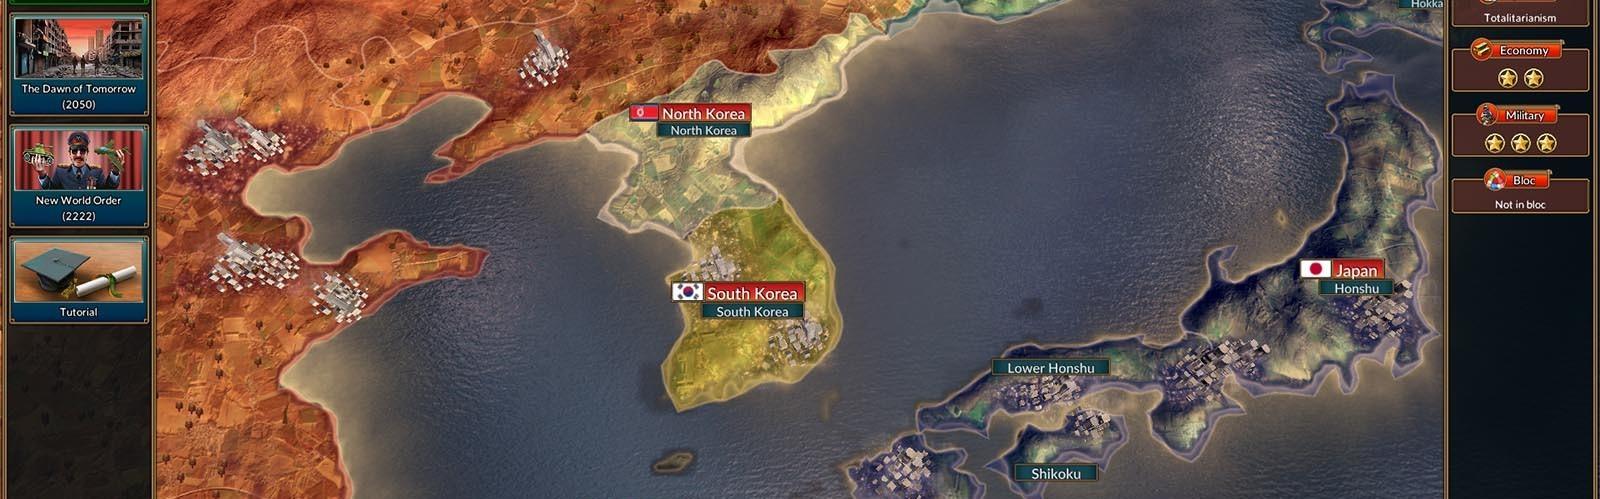 Realpolitiks - New Power (DLC) Steam Key GLOBAL